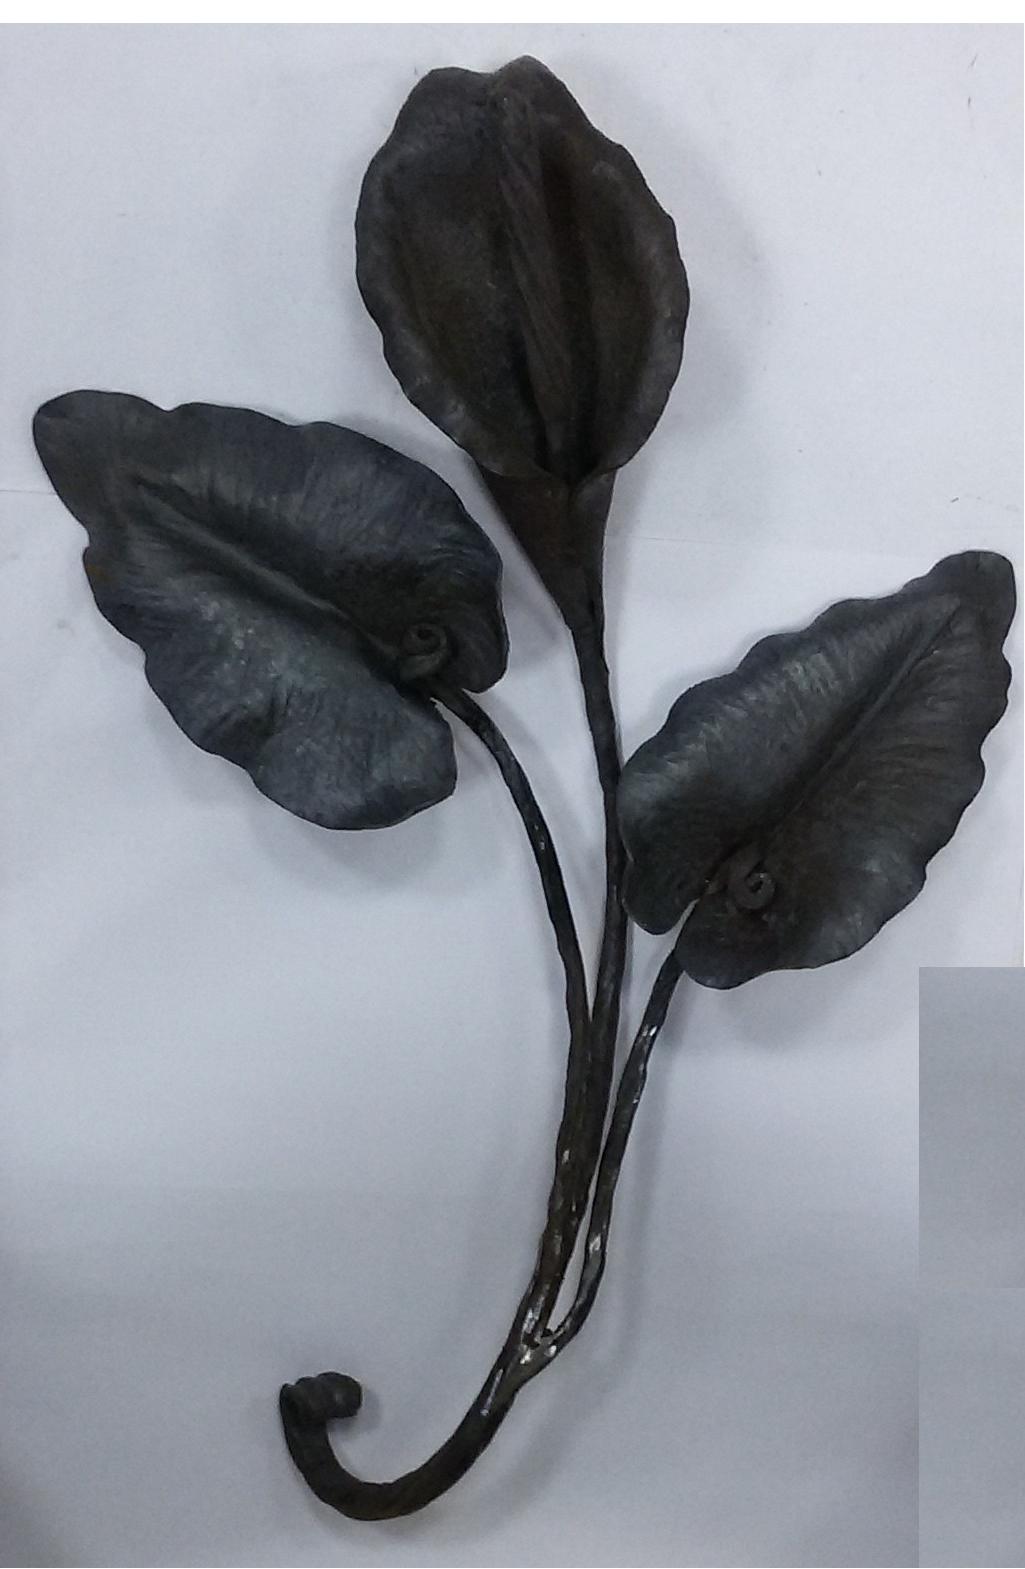 Цветок «Калл» с листьями